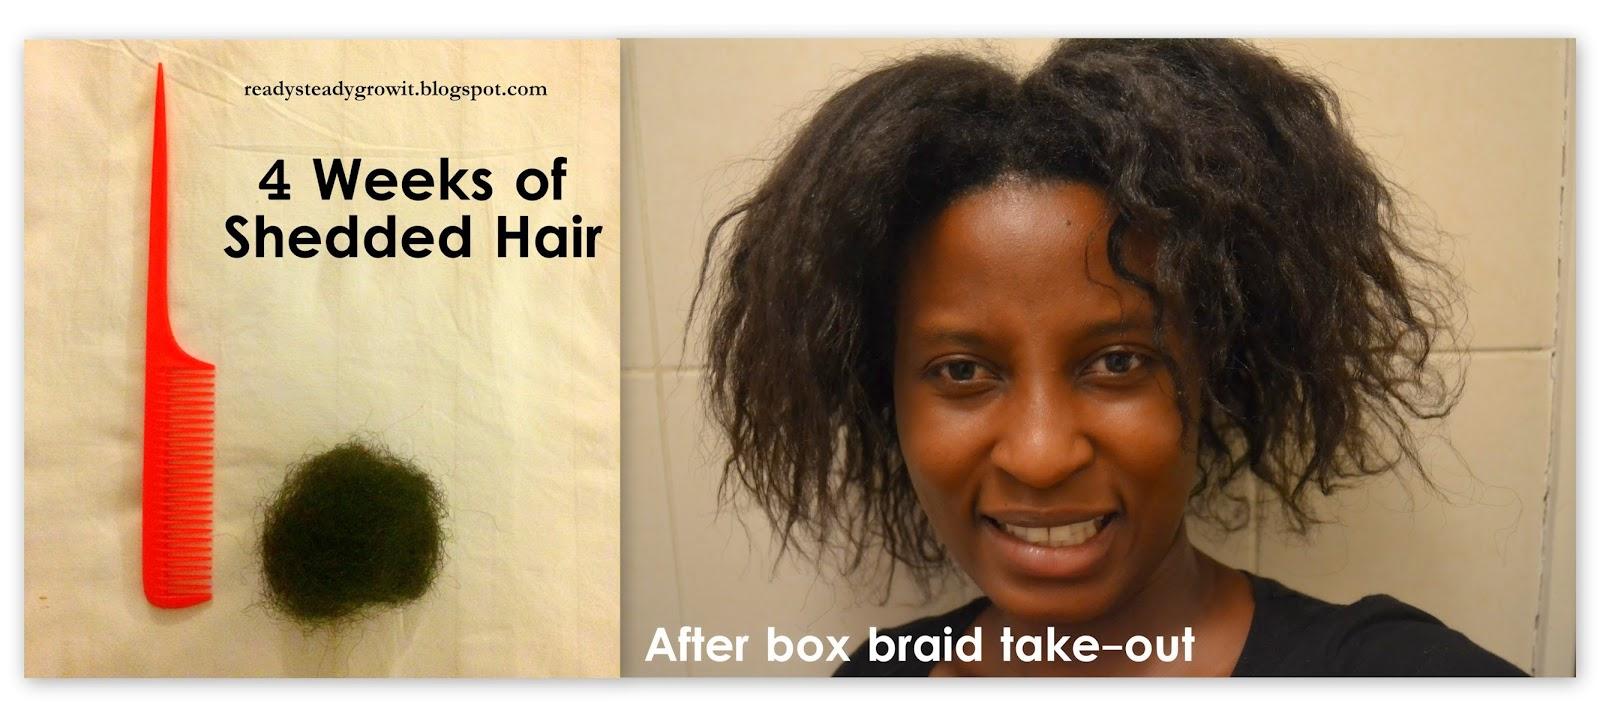 Recap on my box braids - Ready, Steady, Grow It